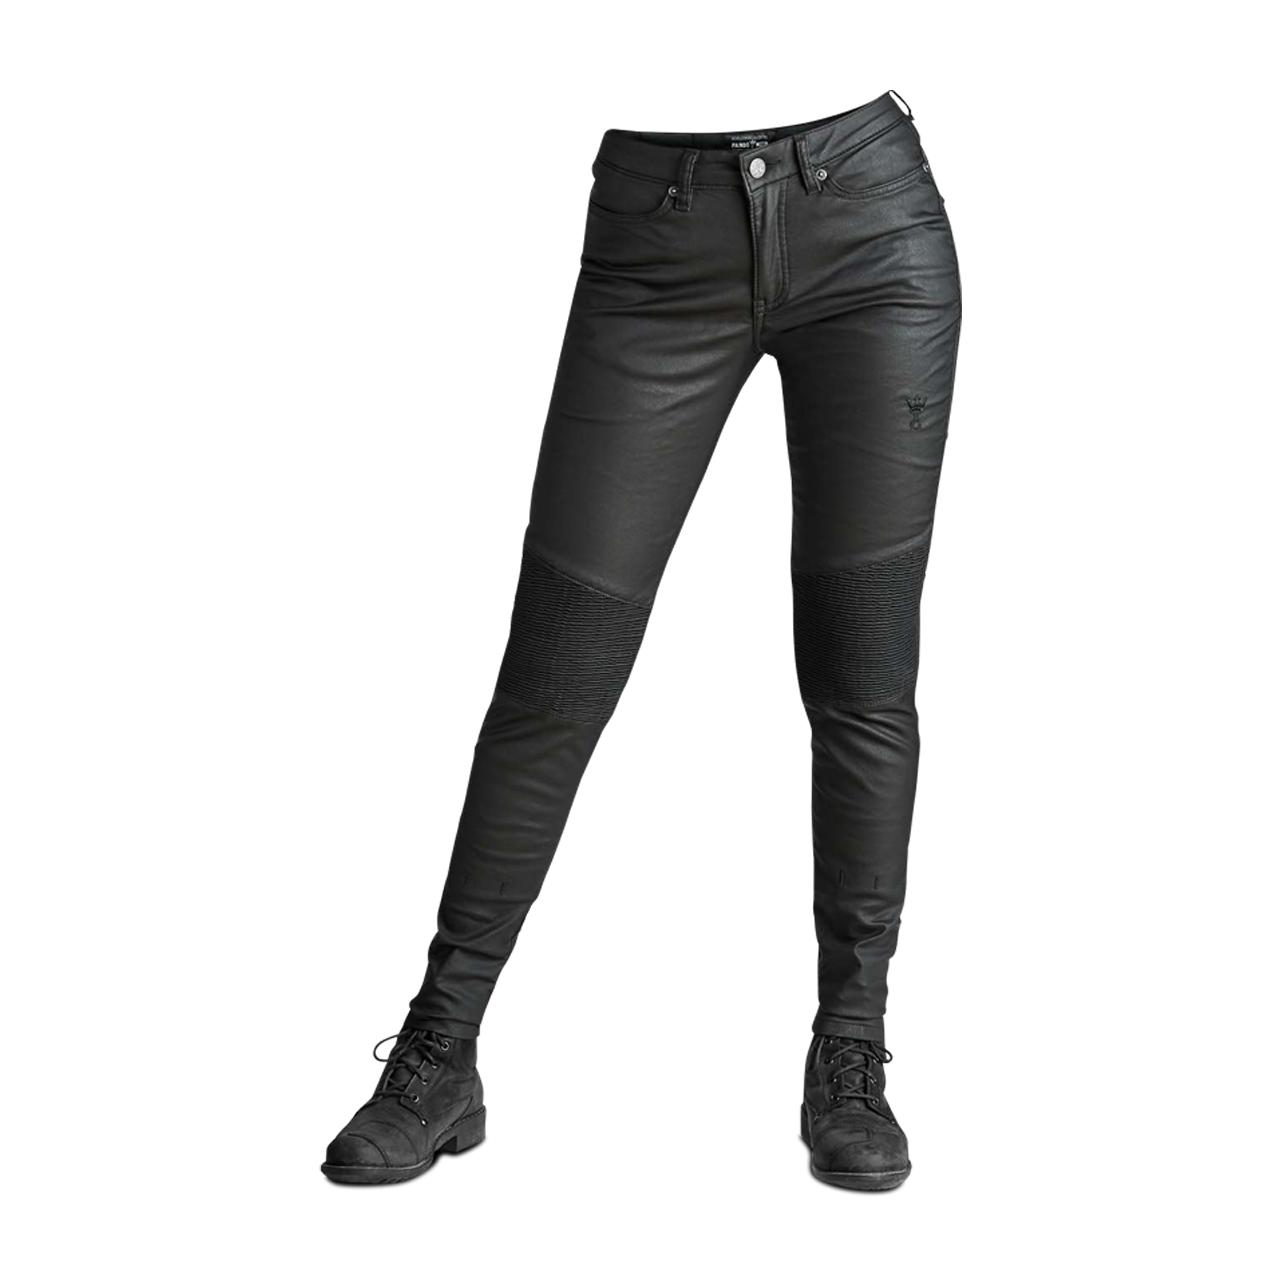 Pando Moto Jeans Moto Donna  Kusari Kev 01 Neri